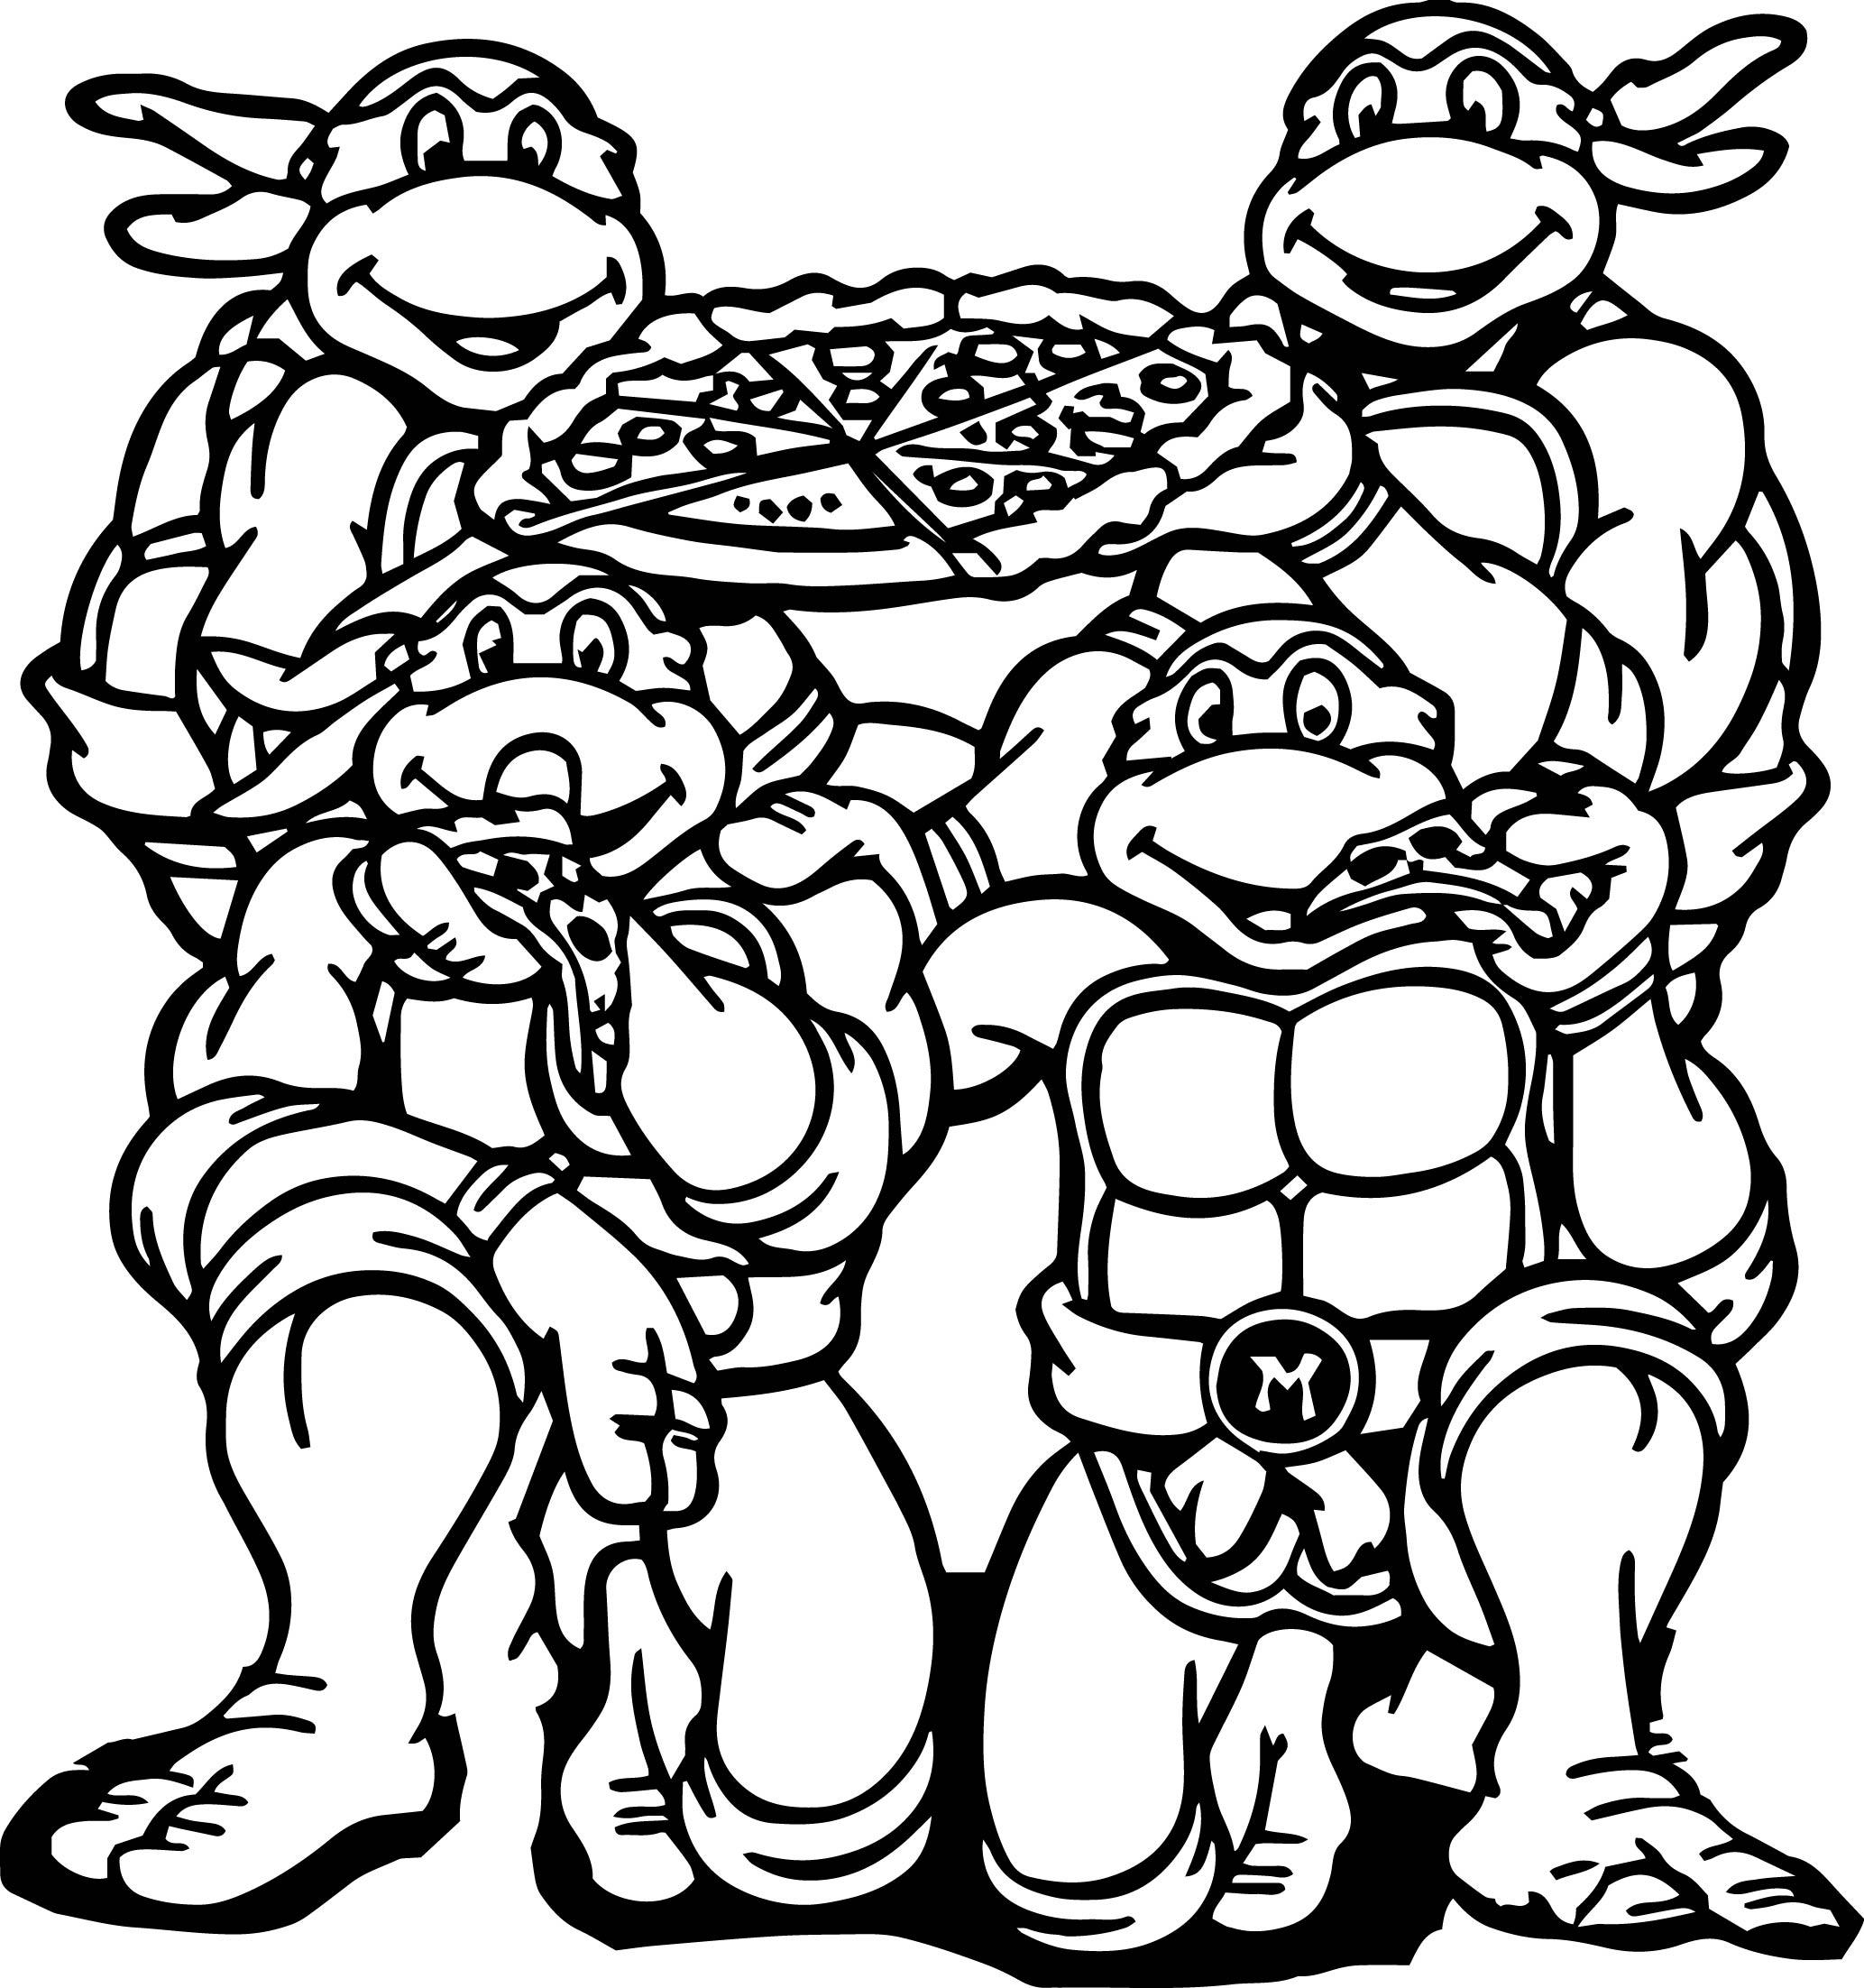 2067x2204 New Teenage Mutant Ninja Turtles Tmnt Coloring Page Donatello